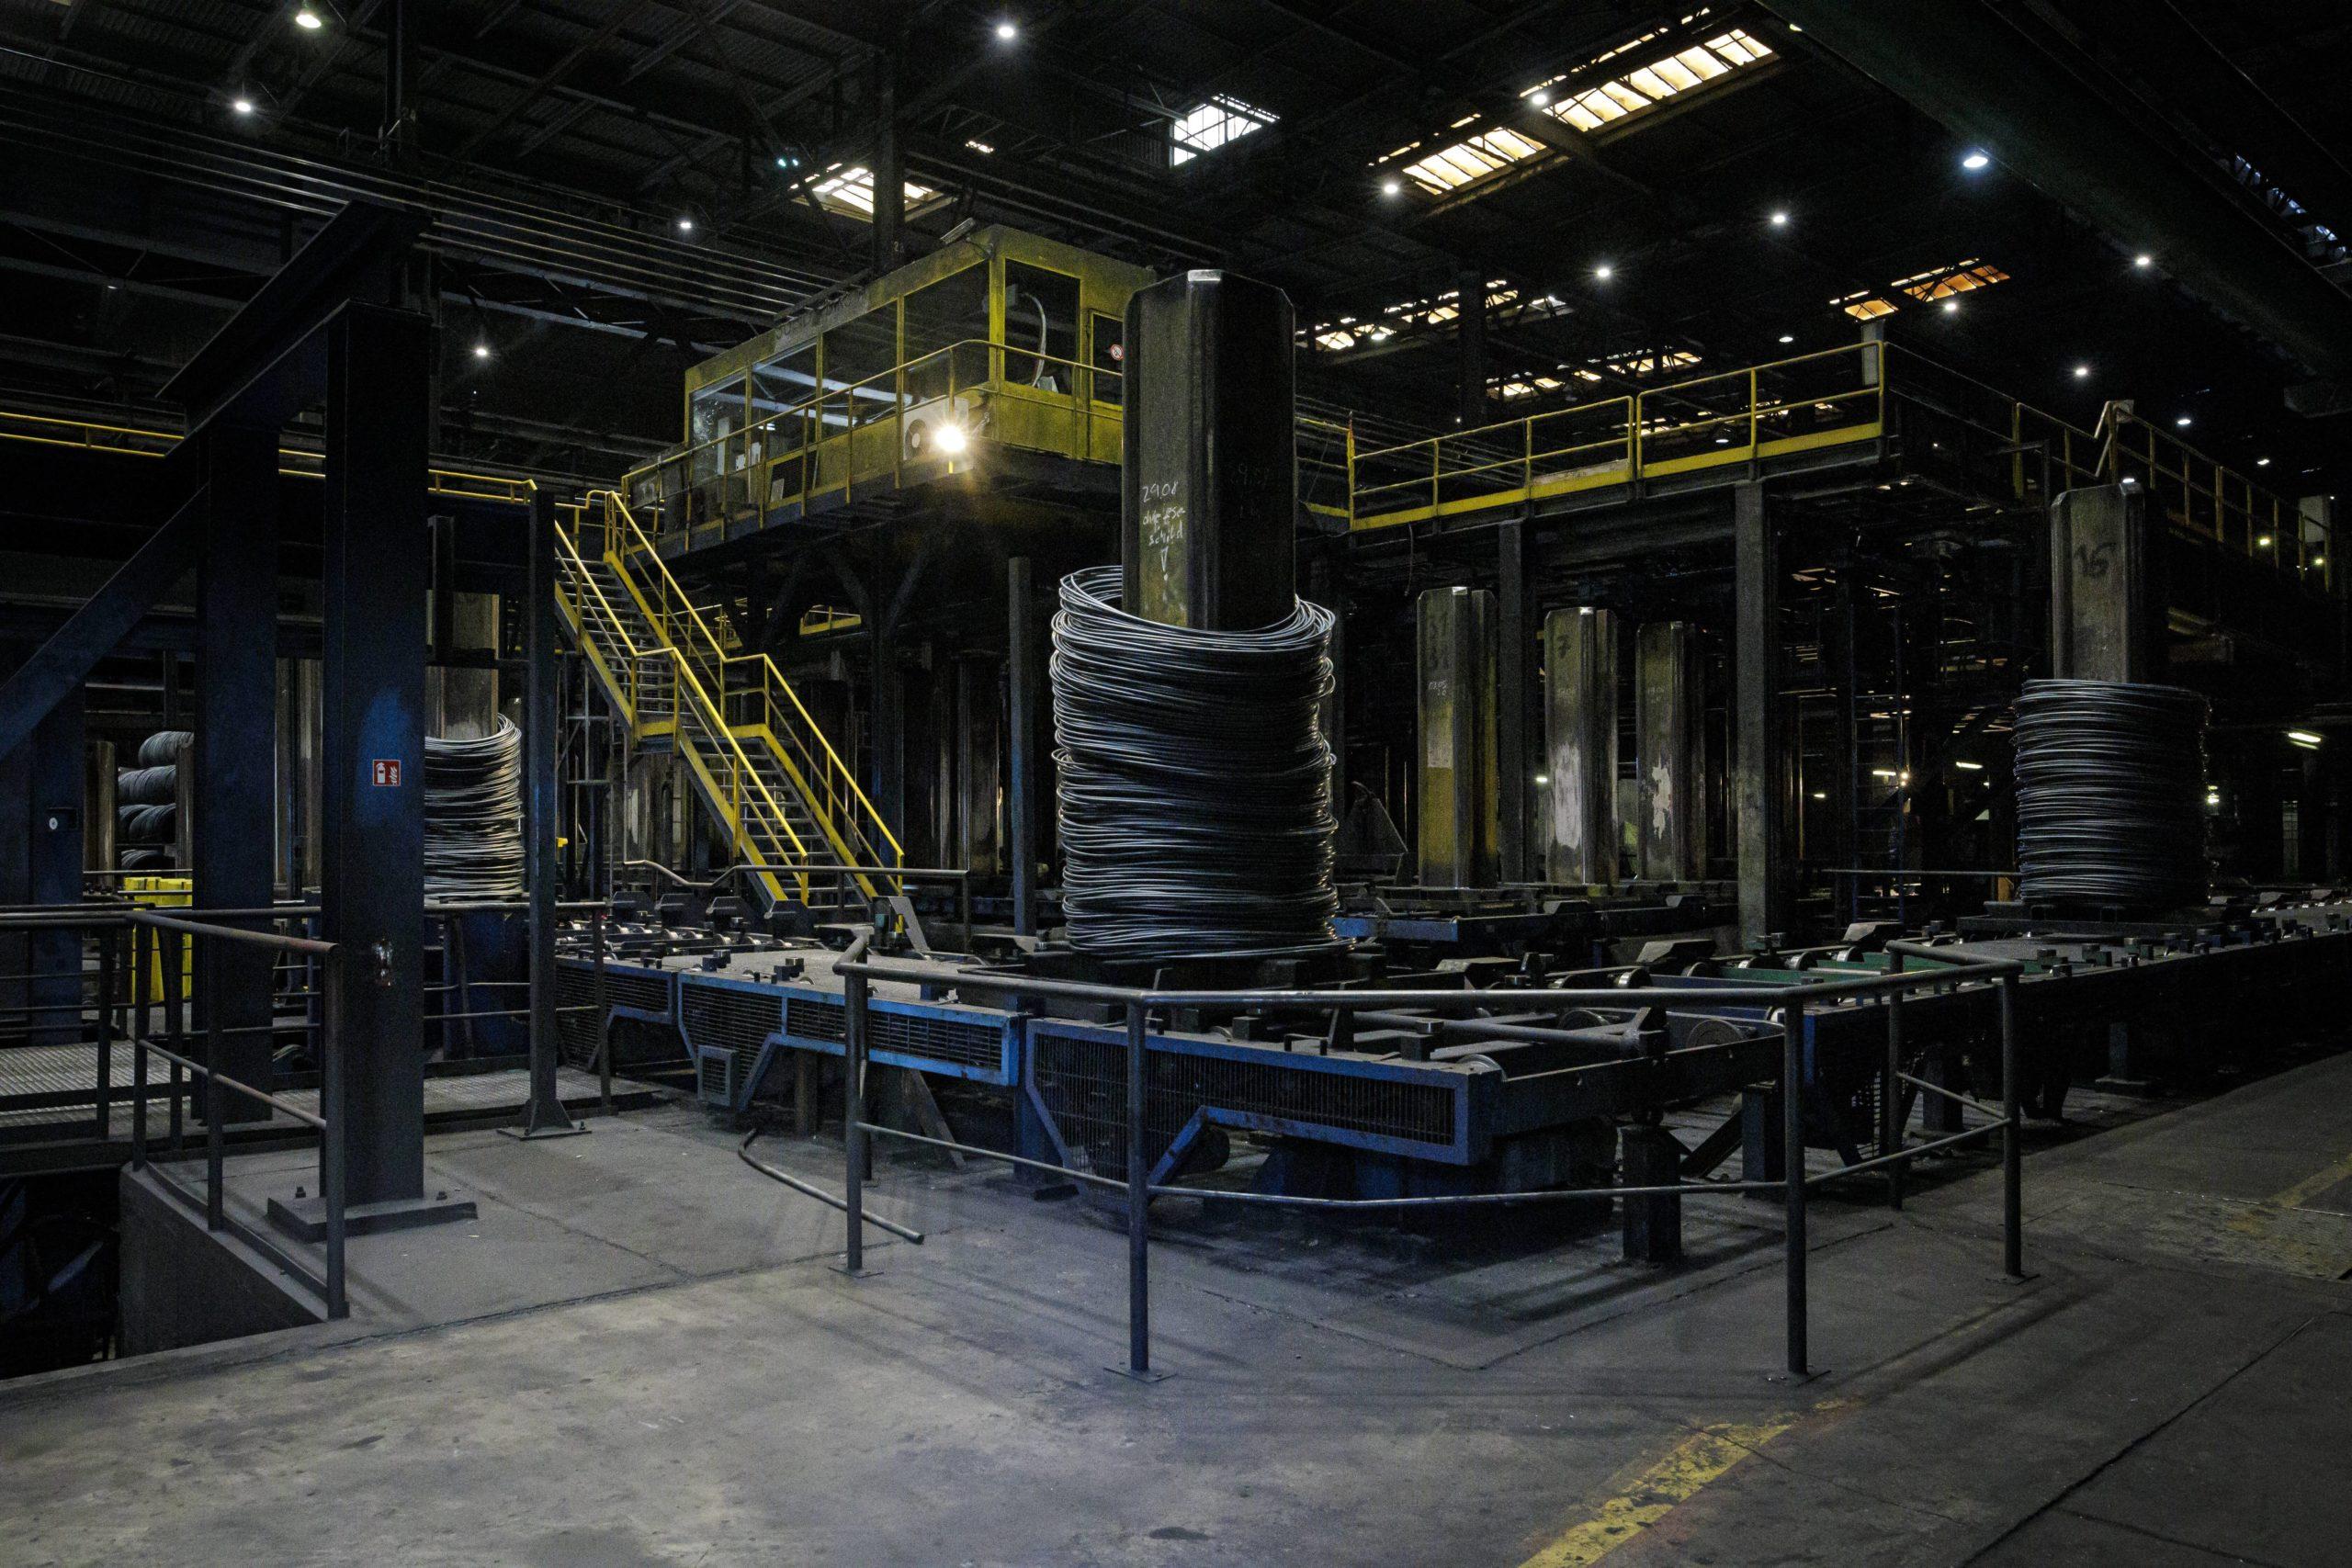 Das Stahlwerk der B.E.S. Brandenburger Elektrostahlwerke GmbH in Brandenburg an der Havel. Foto: Imago/photothek